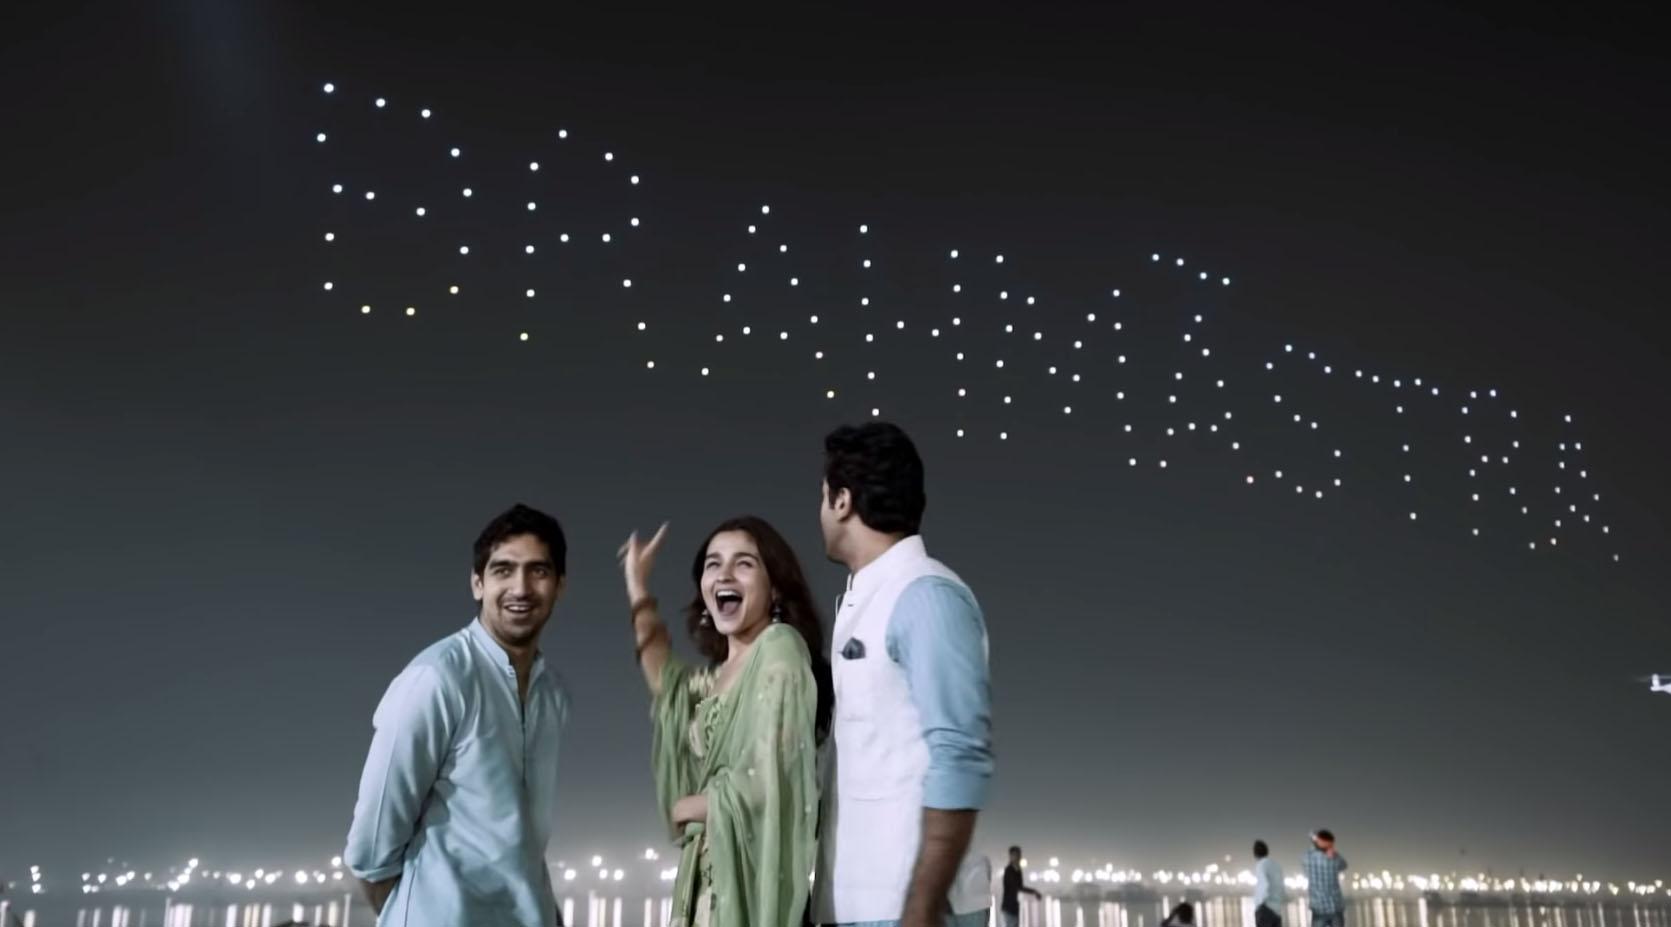 Director Ayan Mukerji, Alia Bhatt & Ranbir Kapoor at the Kumbh Mela for the logo launch of their new film Brahmastra